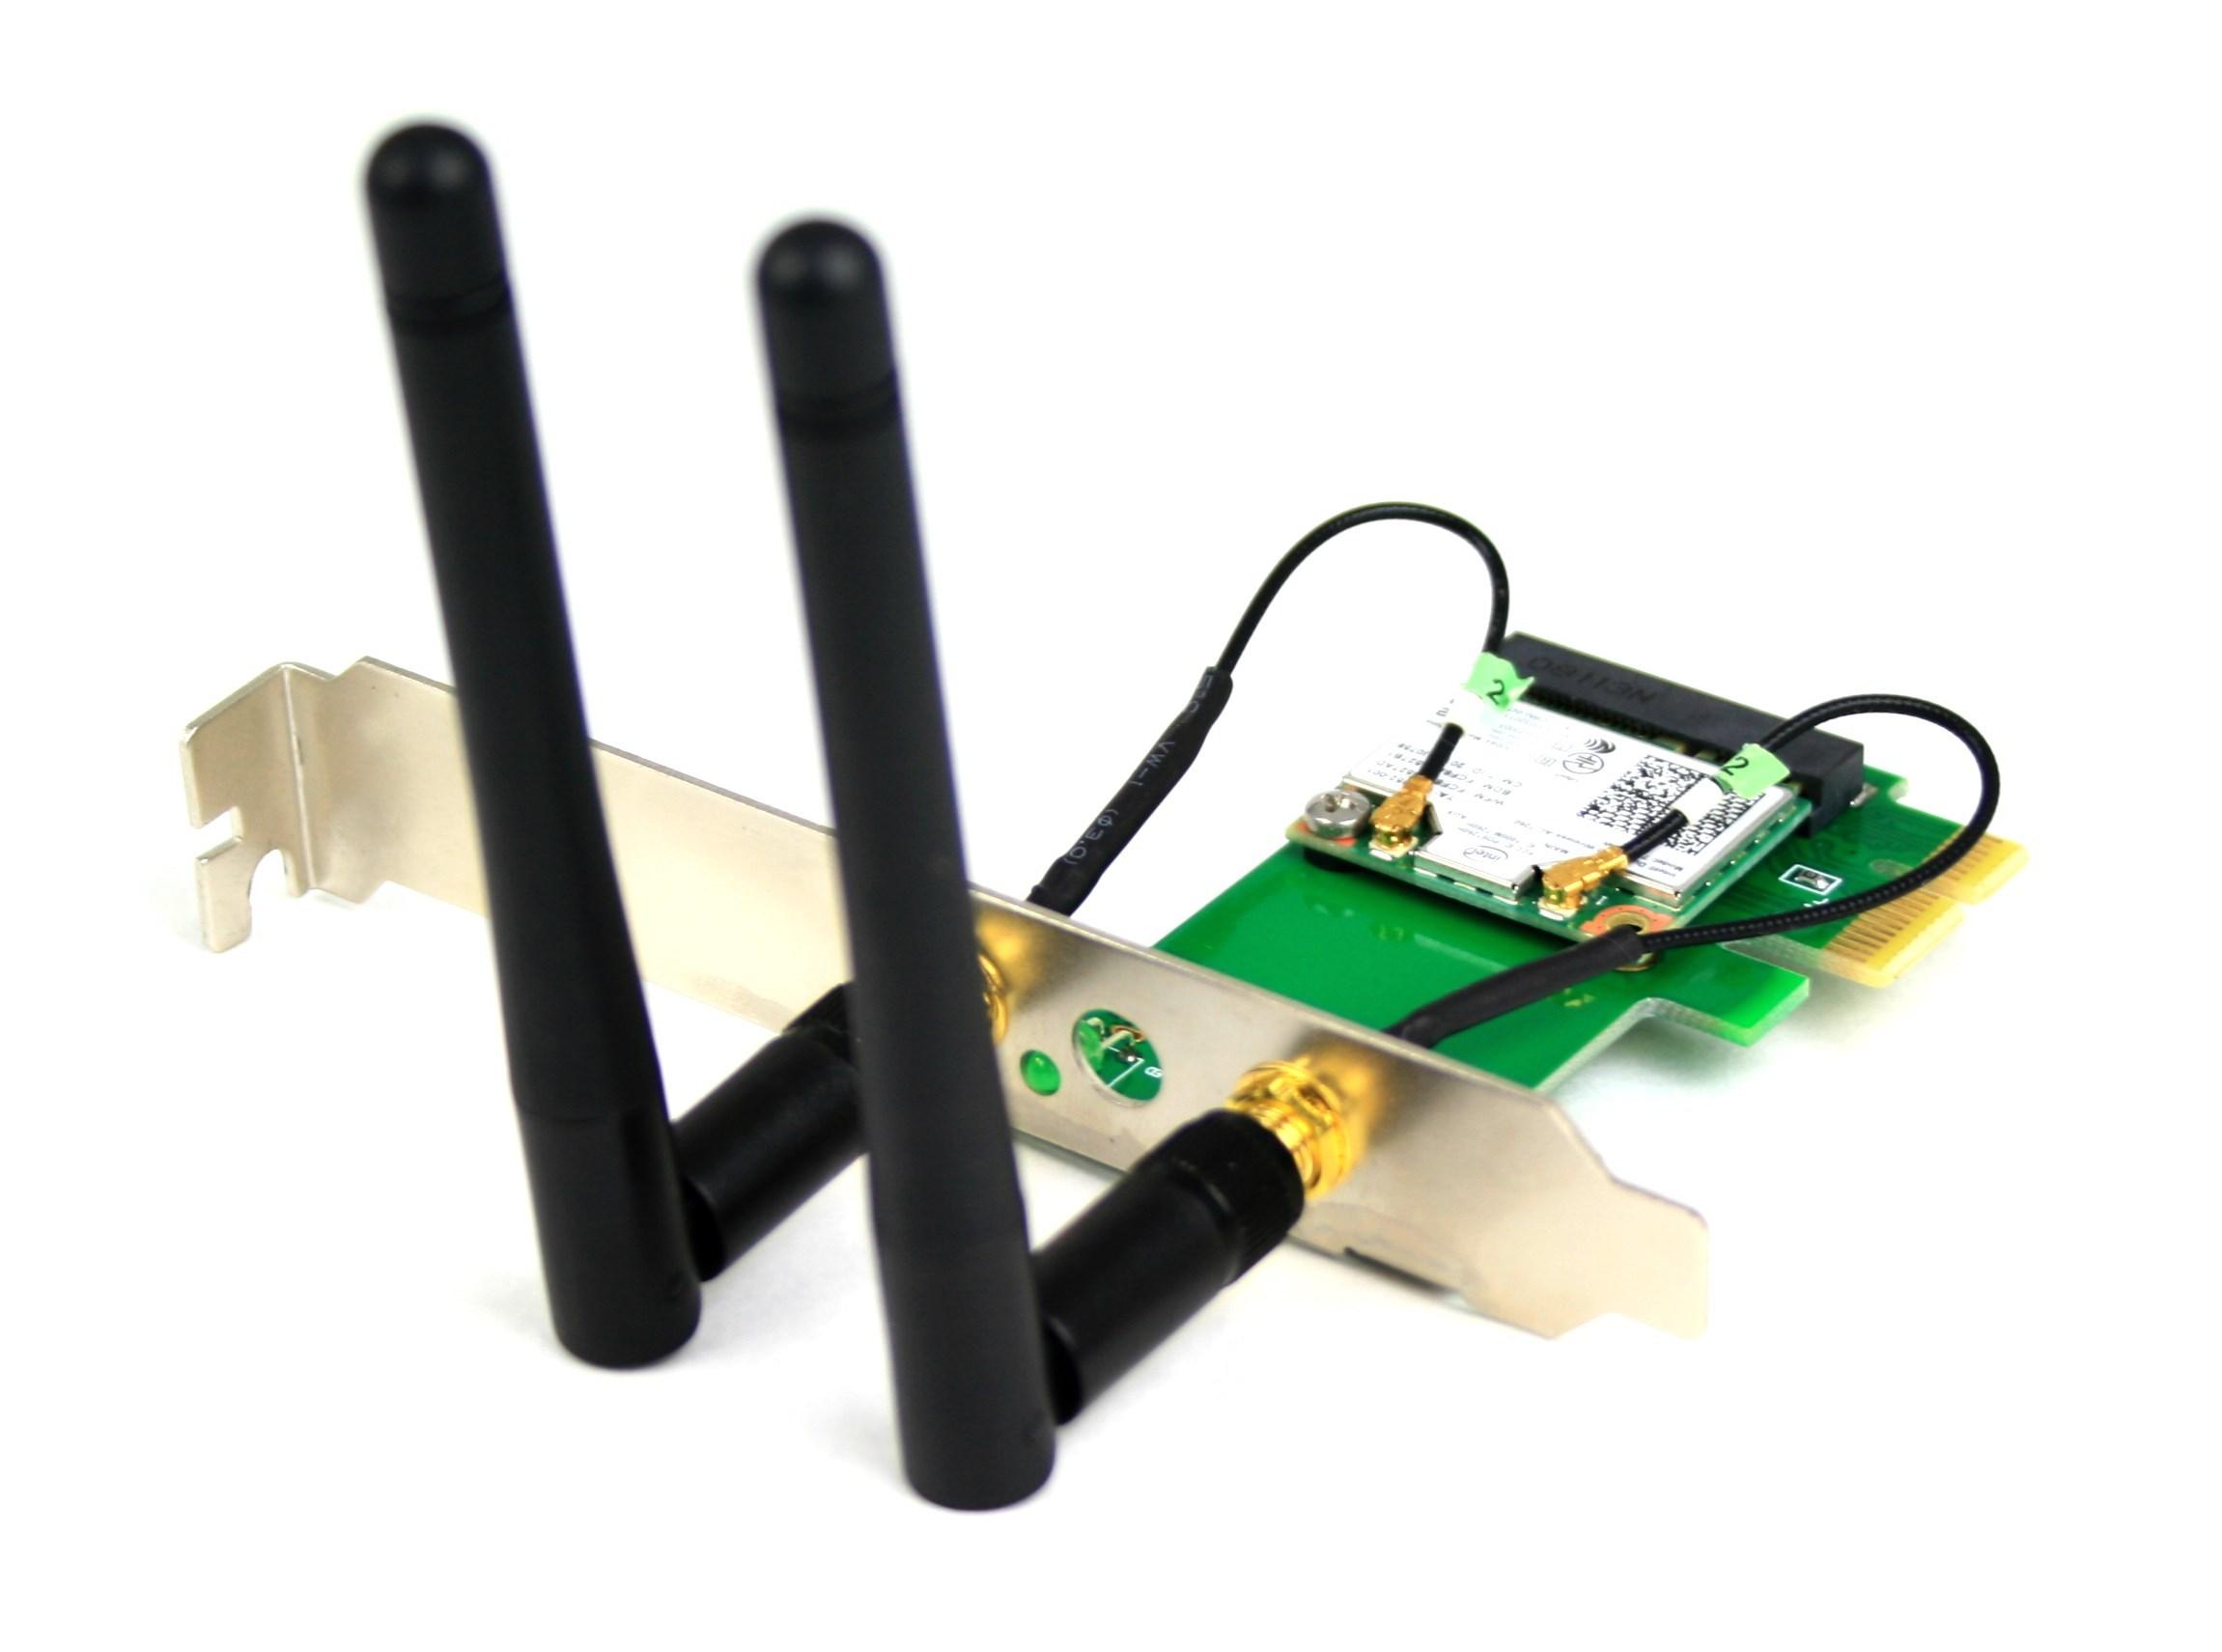 Configure PC w/ Intel WiFi 7260 HMW 867 Mbps 802 11ac Mini-PCIe Card